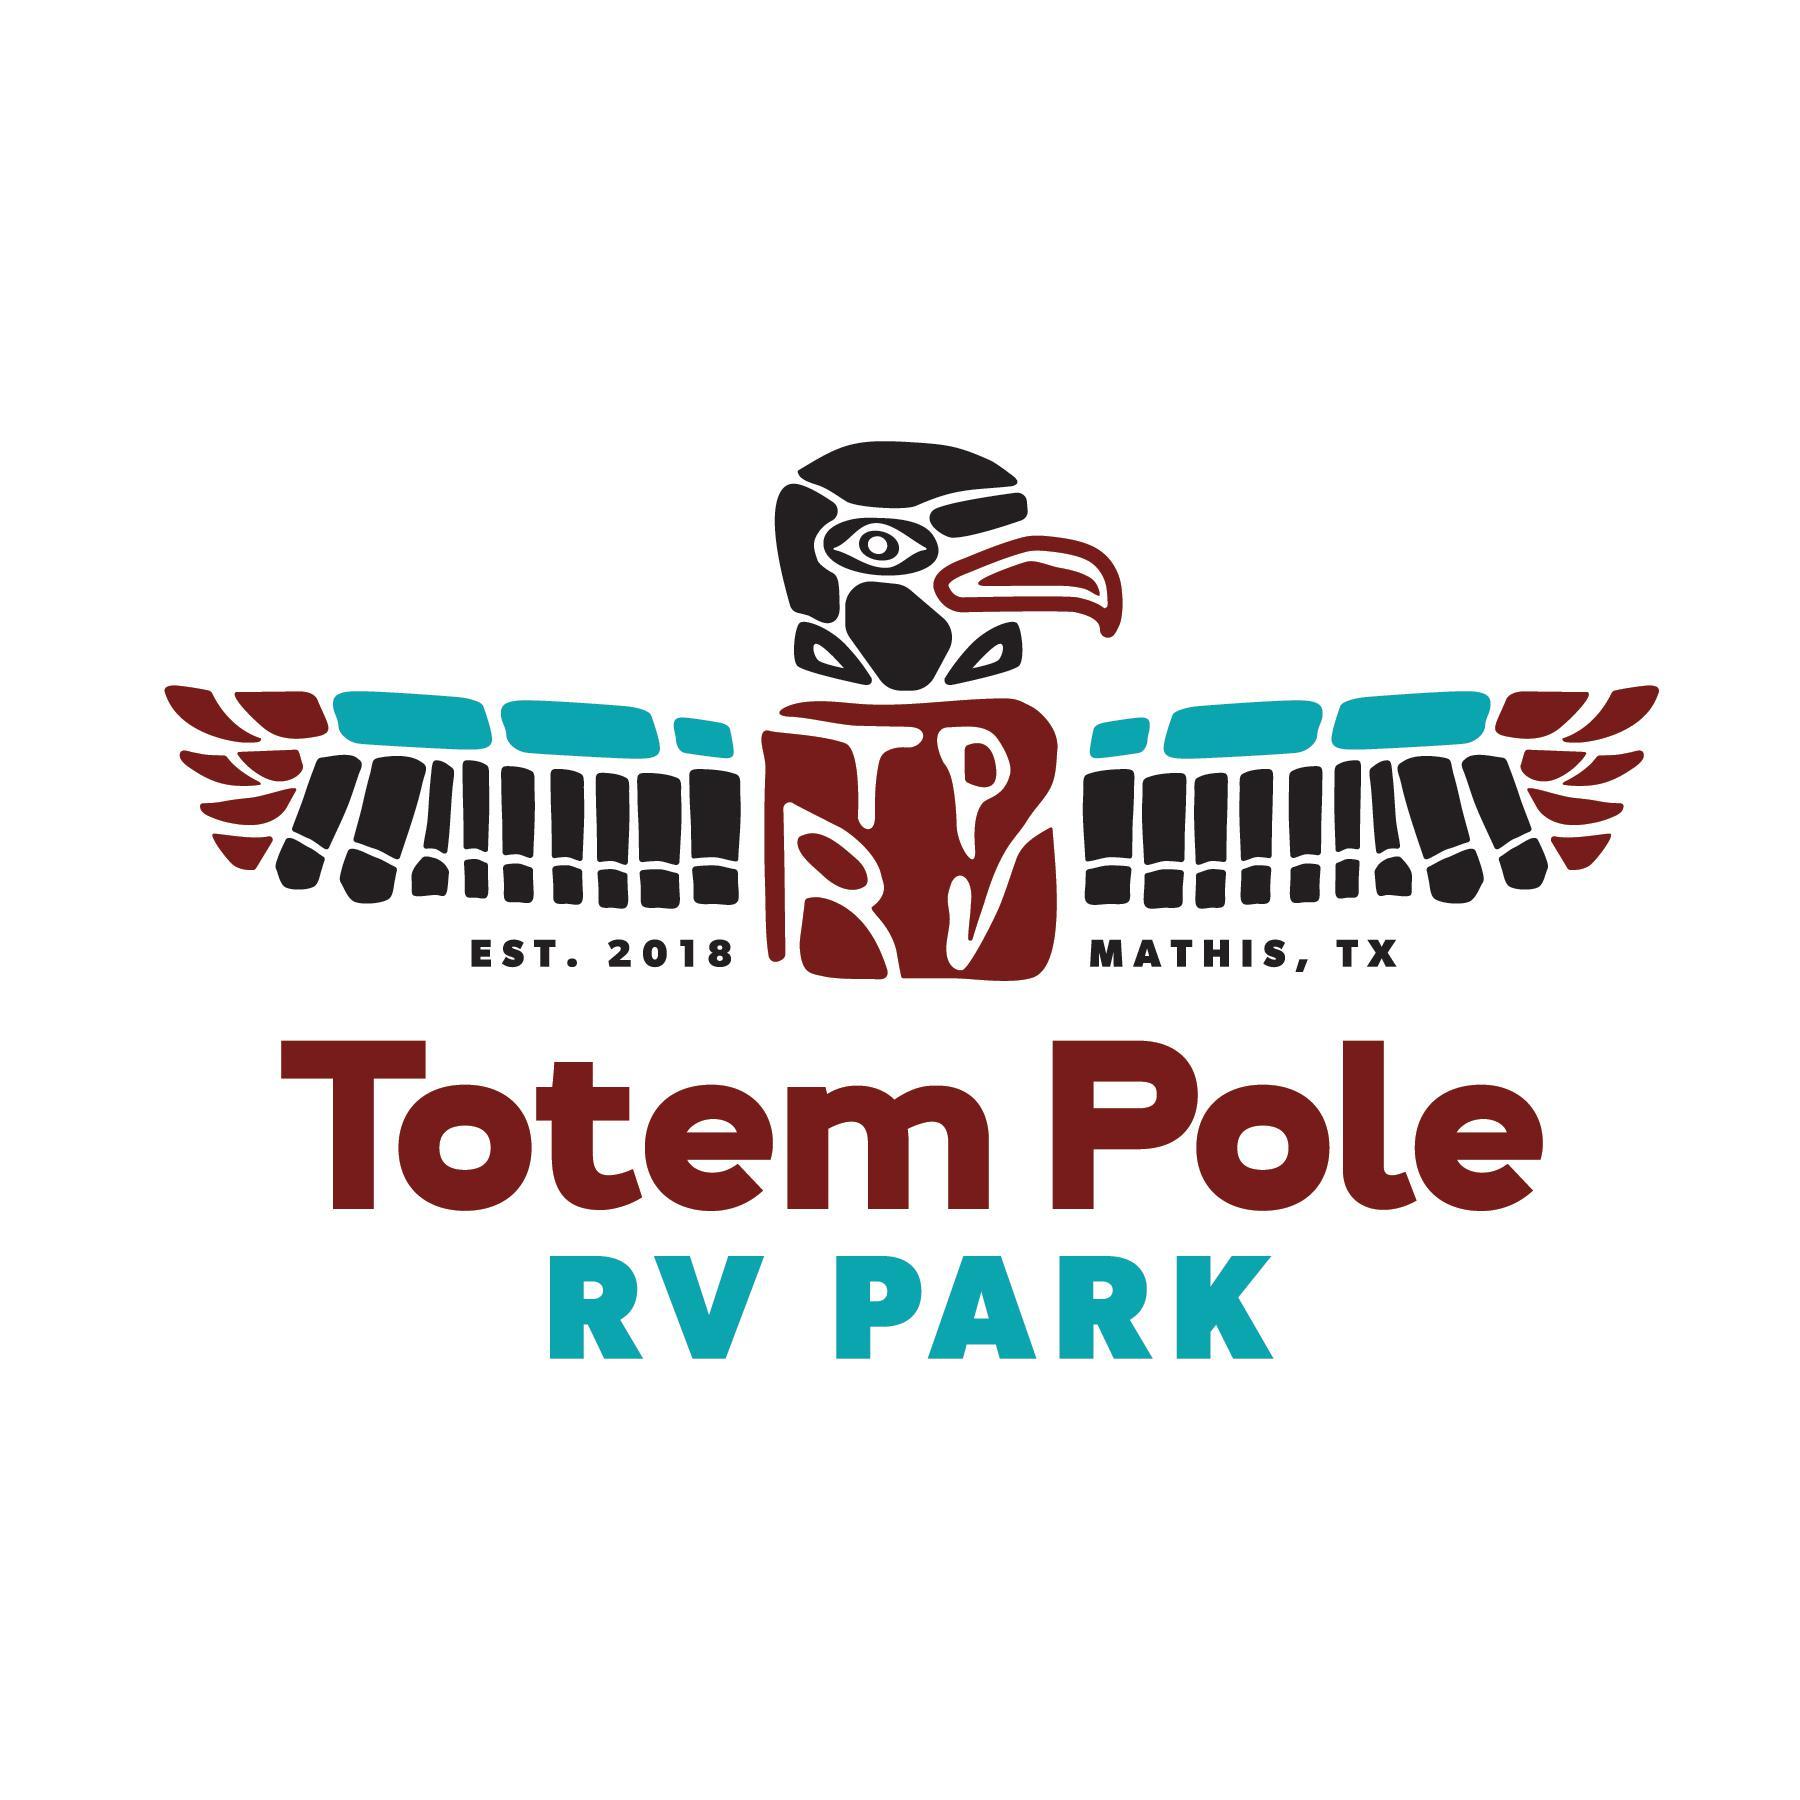 Totem Pole RV Park